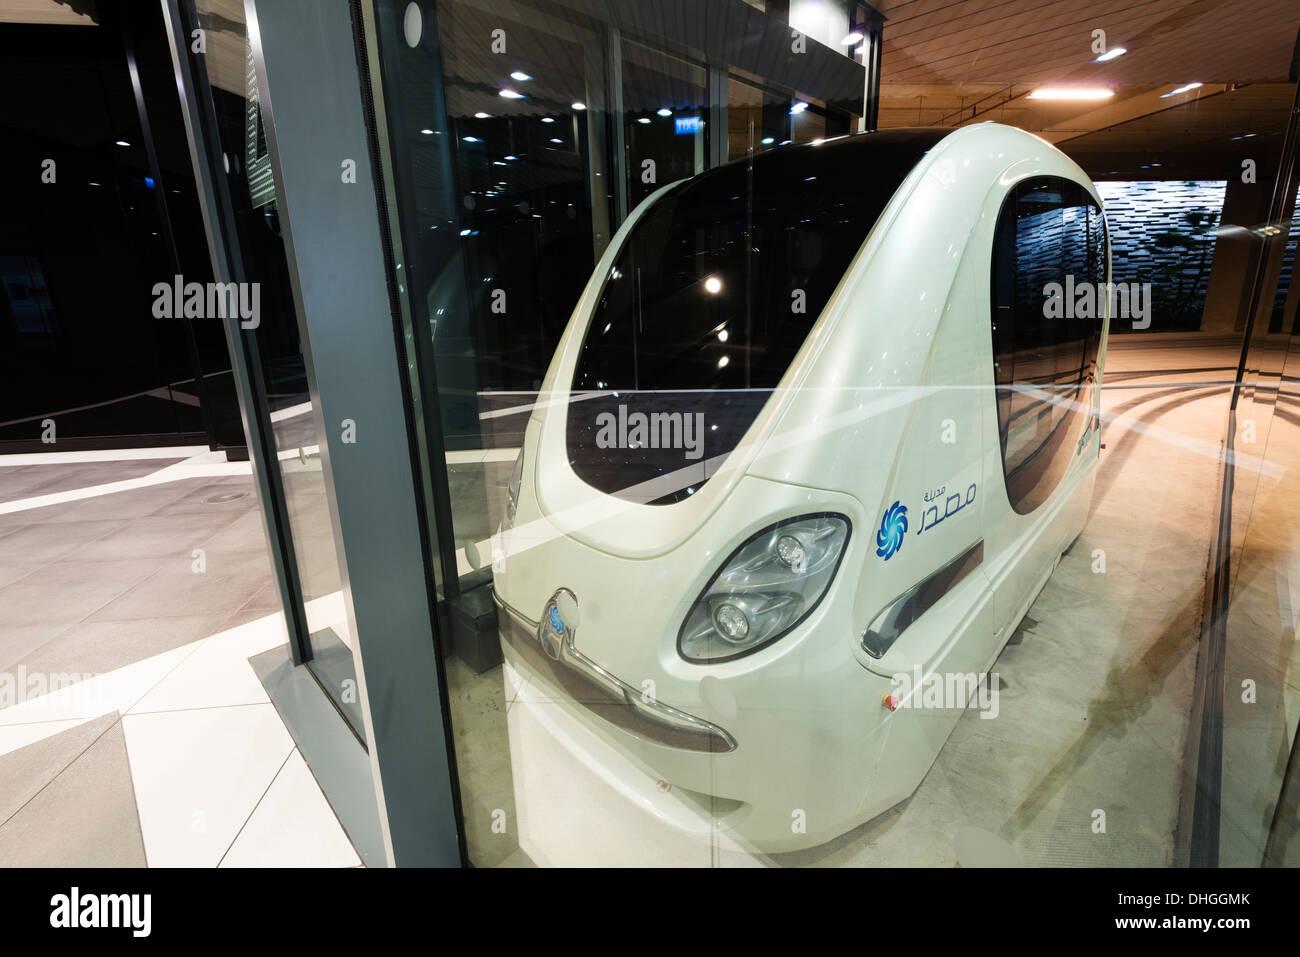 Driverless PRT Personal Rapid Transport Pod cars en el instituto técnico de la ciudad de Masdar en Abu Dhabi, Emiratos Árabes Unidos Imagen De Stock